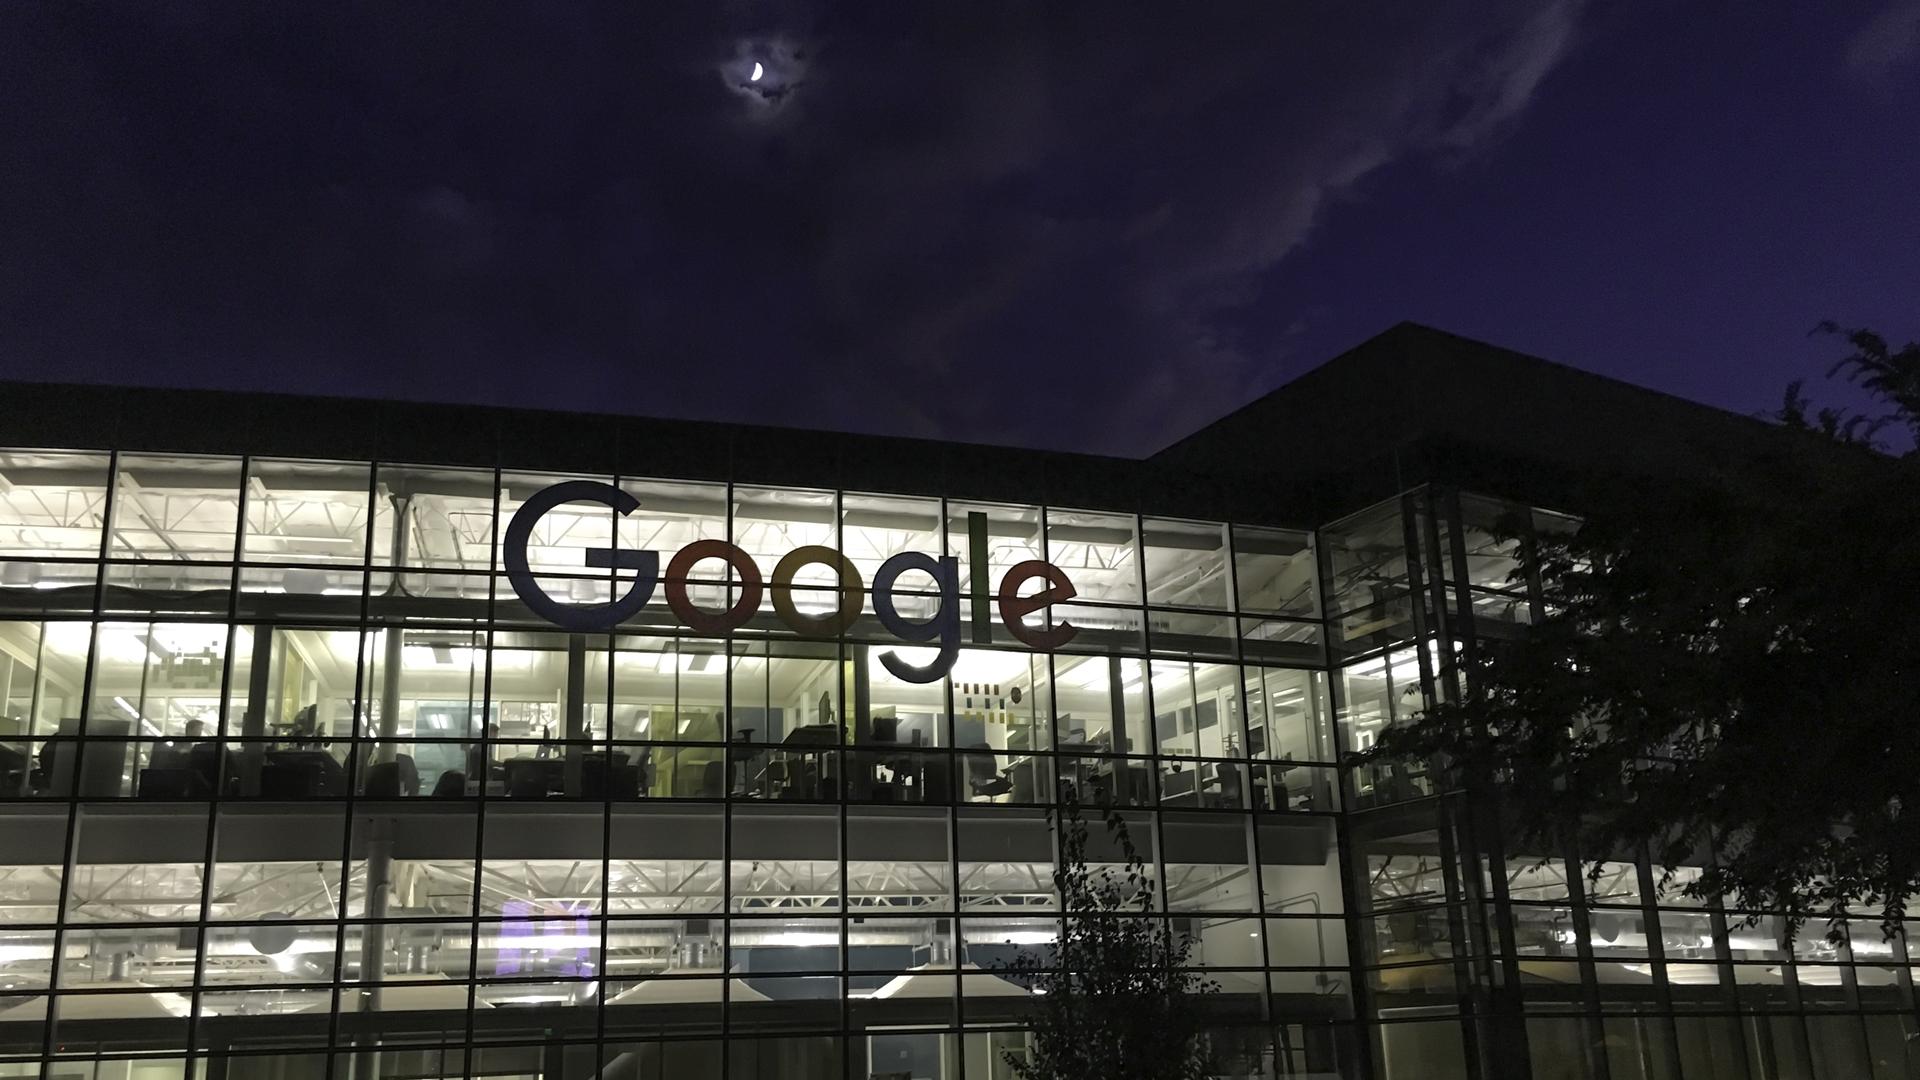 Google nuit